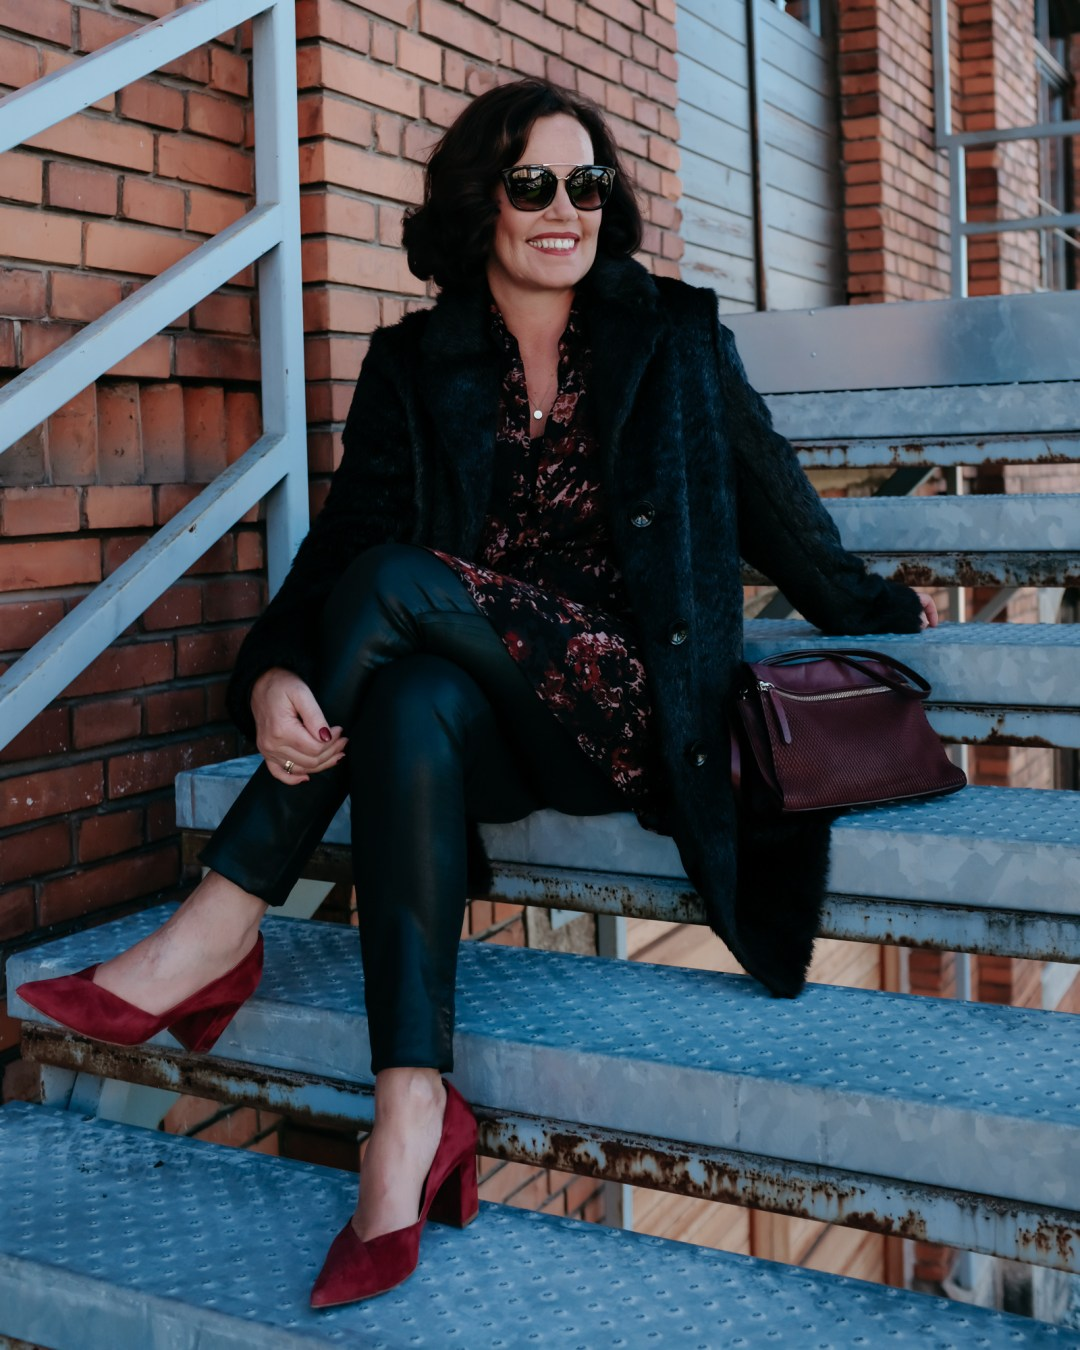 DSCF9796.styleover50 elegantstyle autumnautfit fashionista